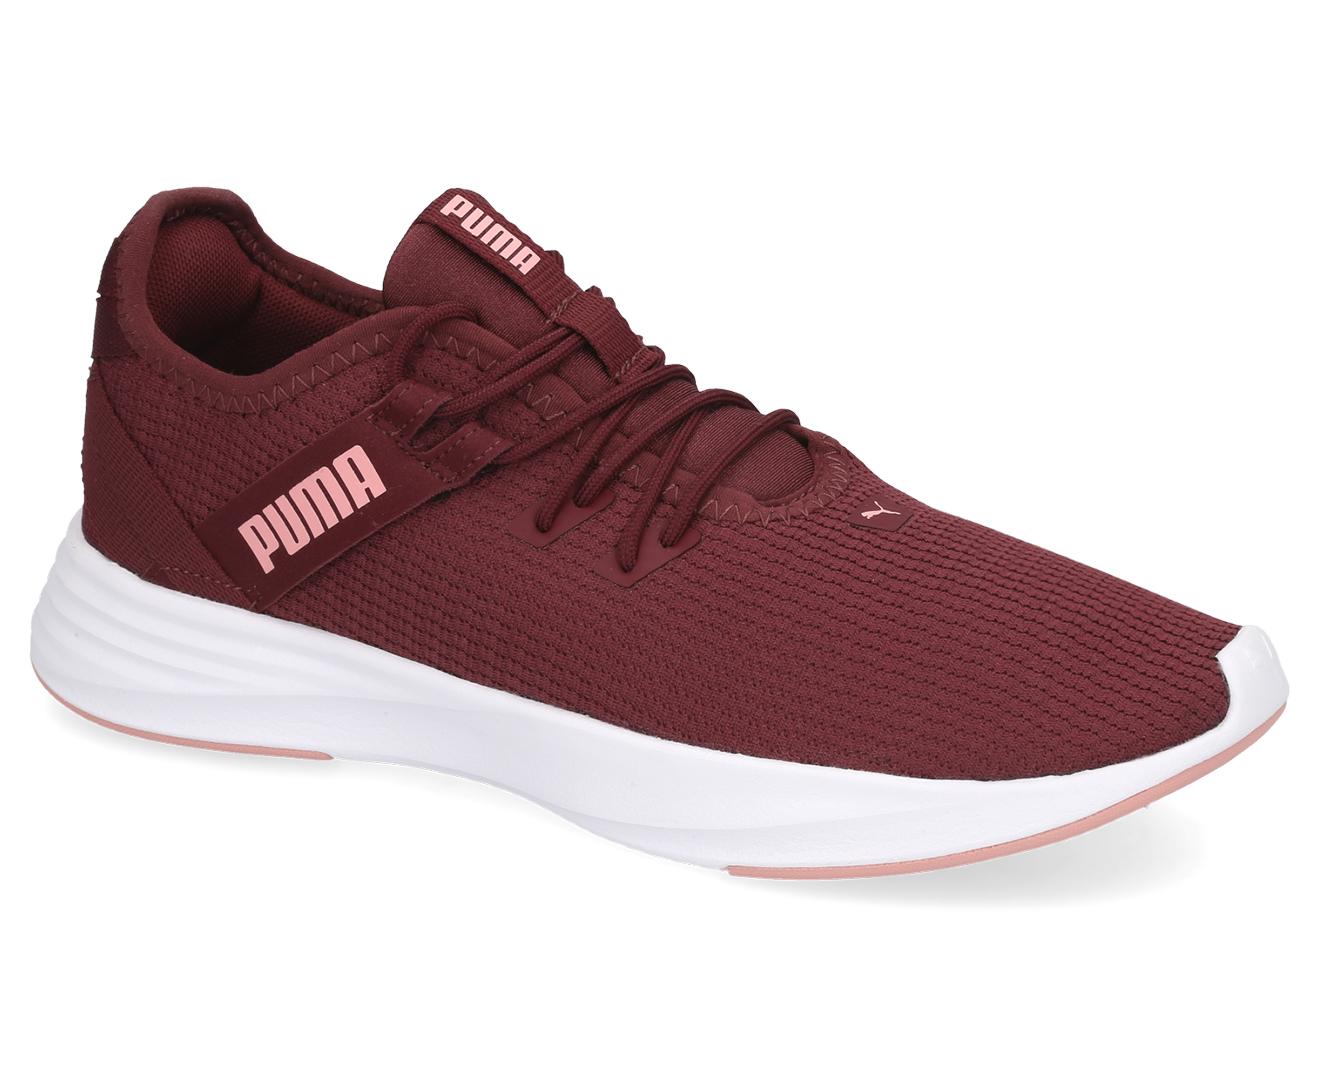 Details about Puma Women's Radiate XT Training Sports Shoes Vineyard WineBridal Rose